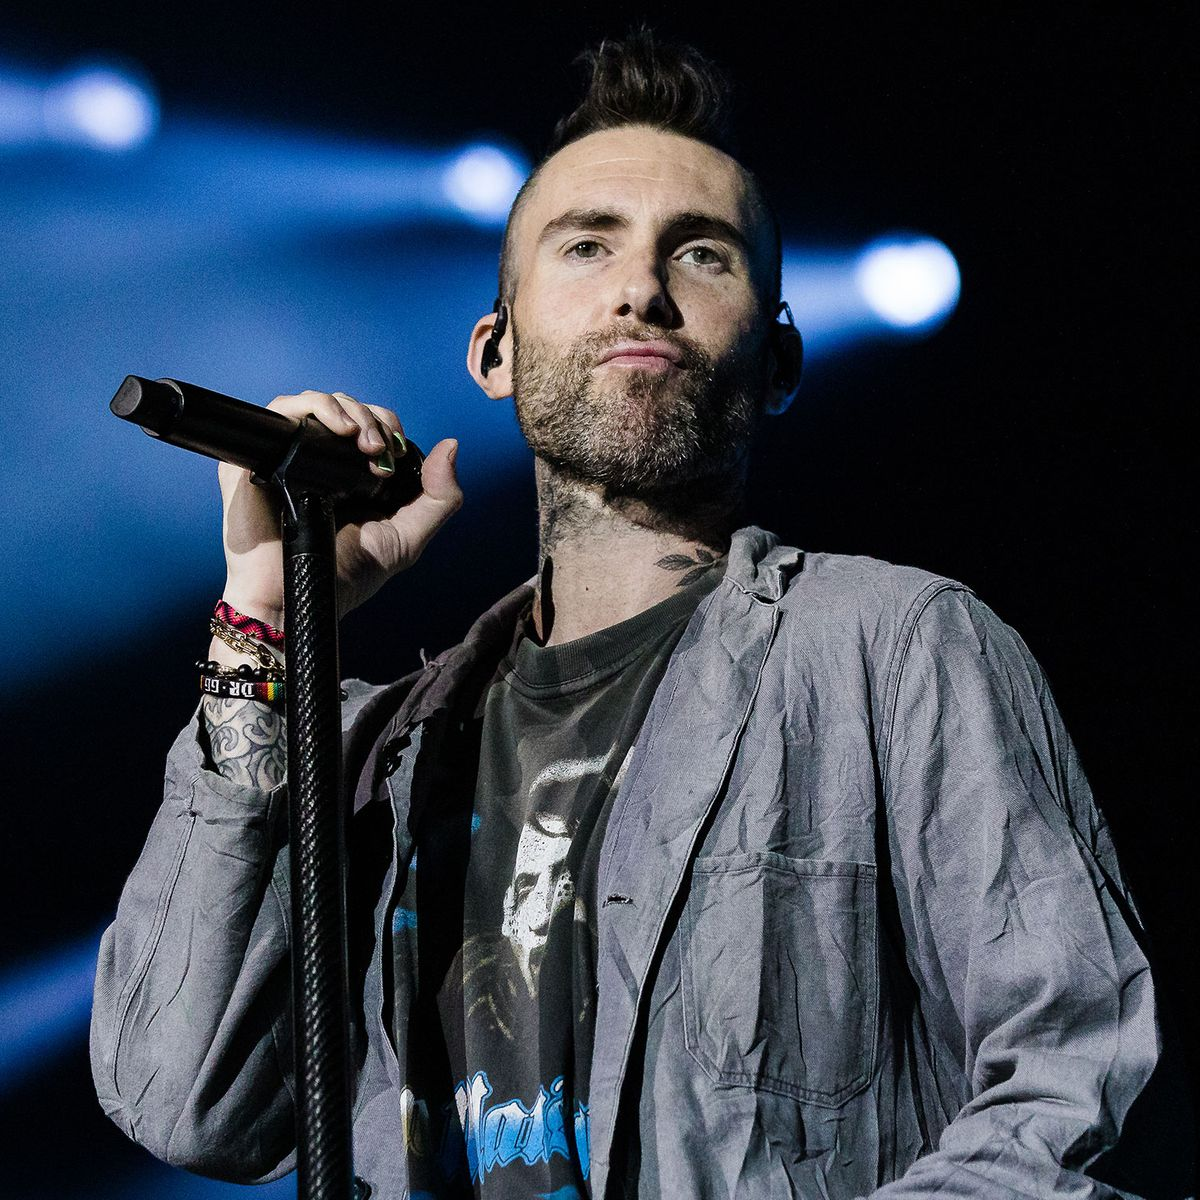 Who is maroon 5 lead singer